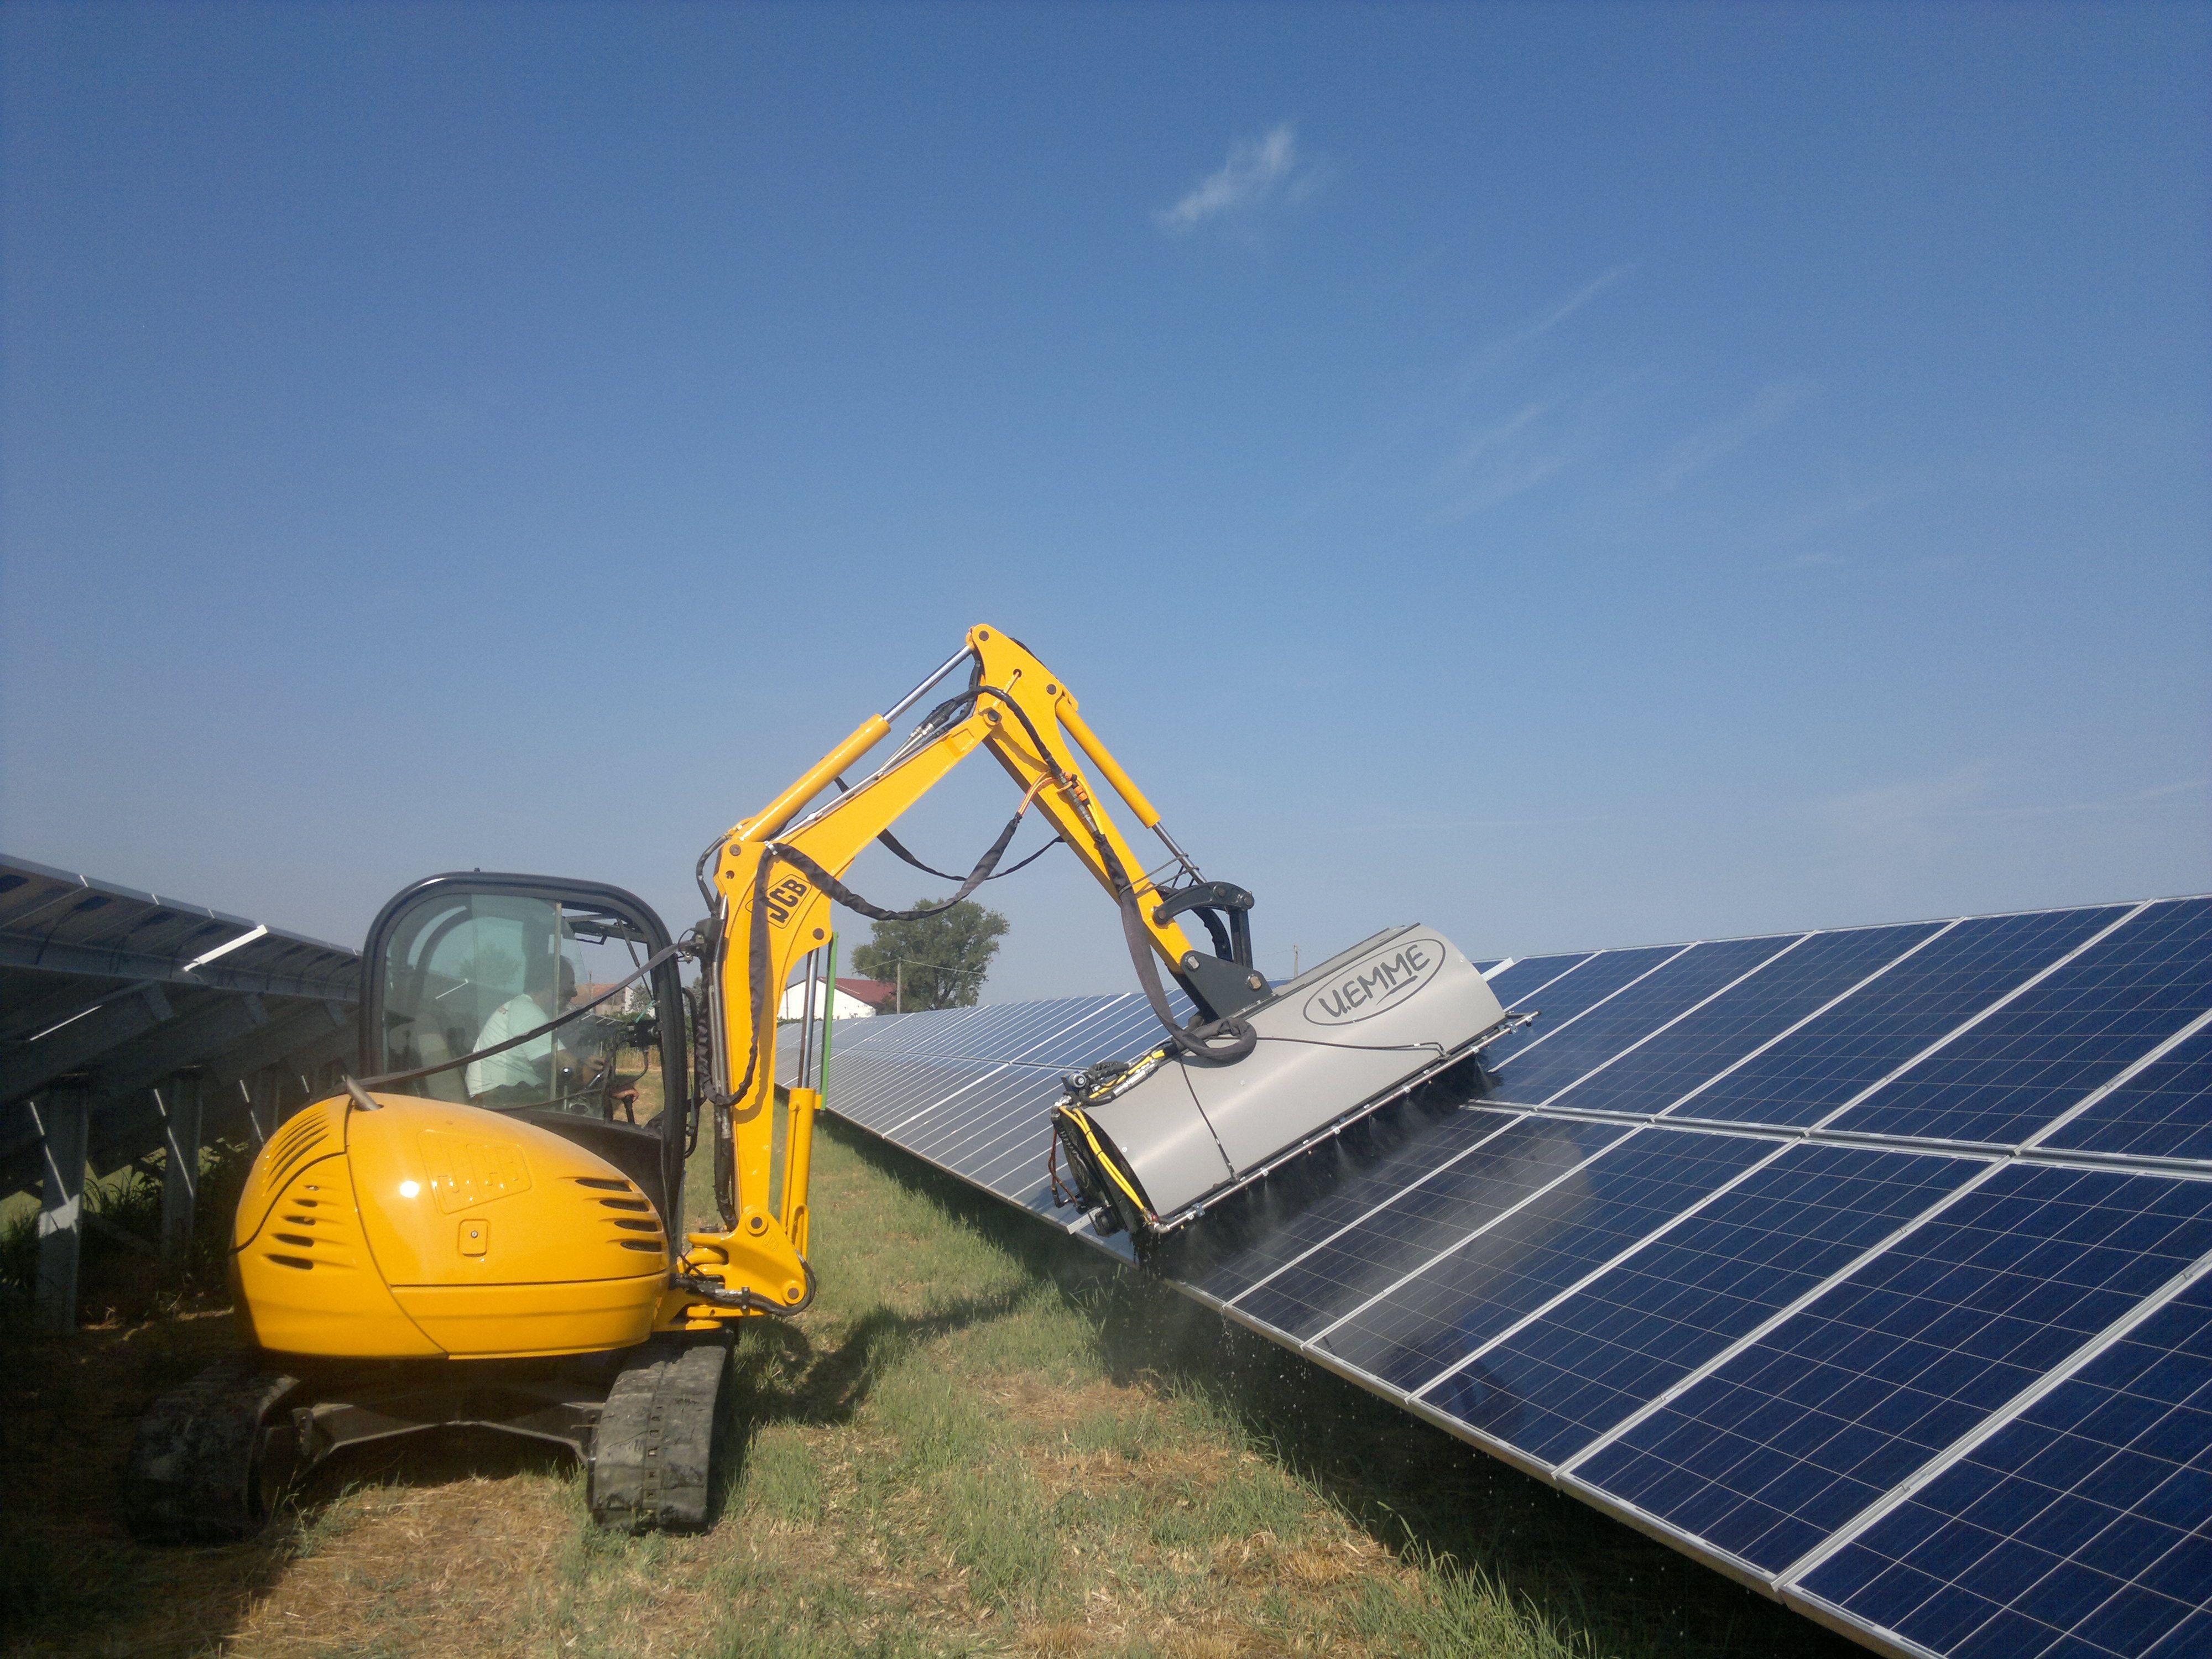 FOTOVOLTAICO PULITO , pulizia impianti fotovoltaici.